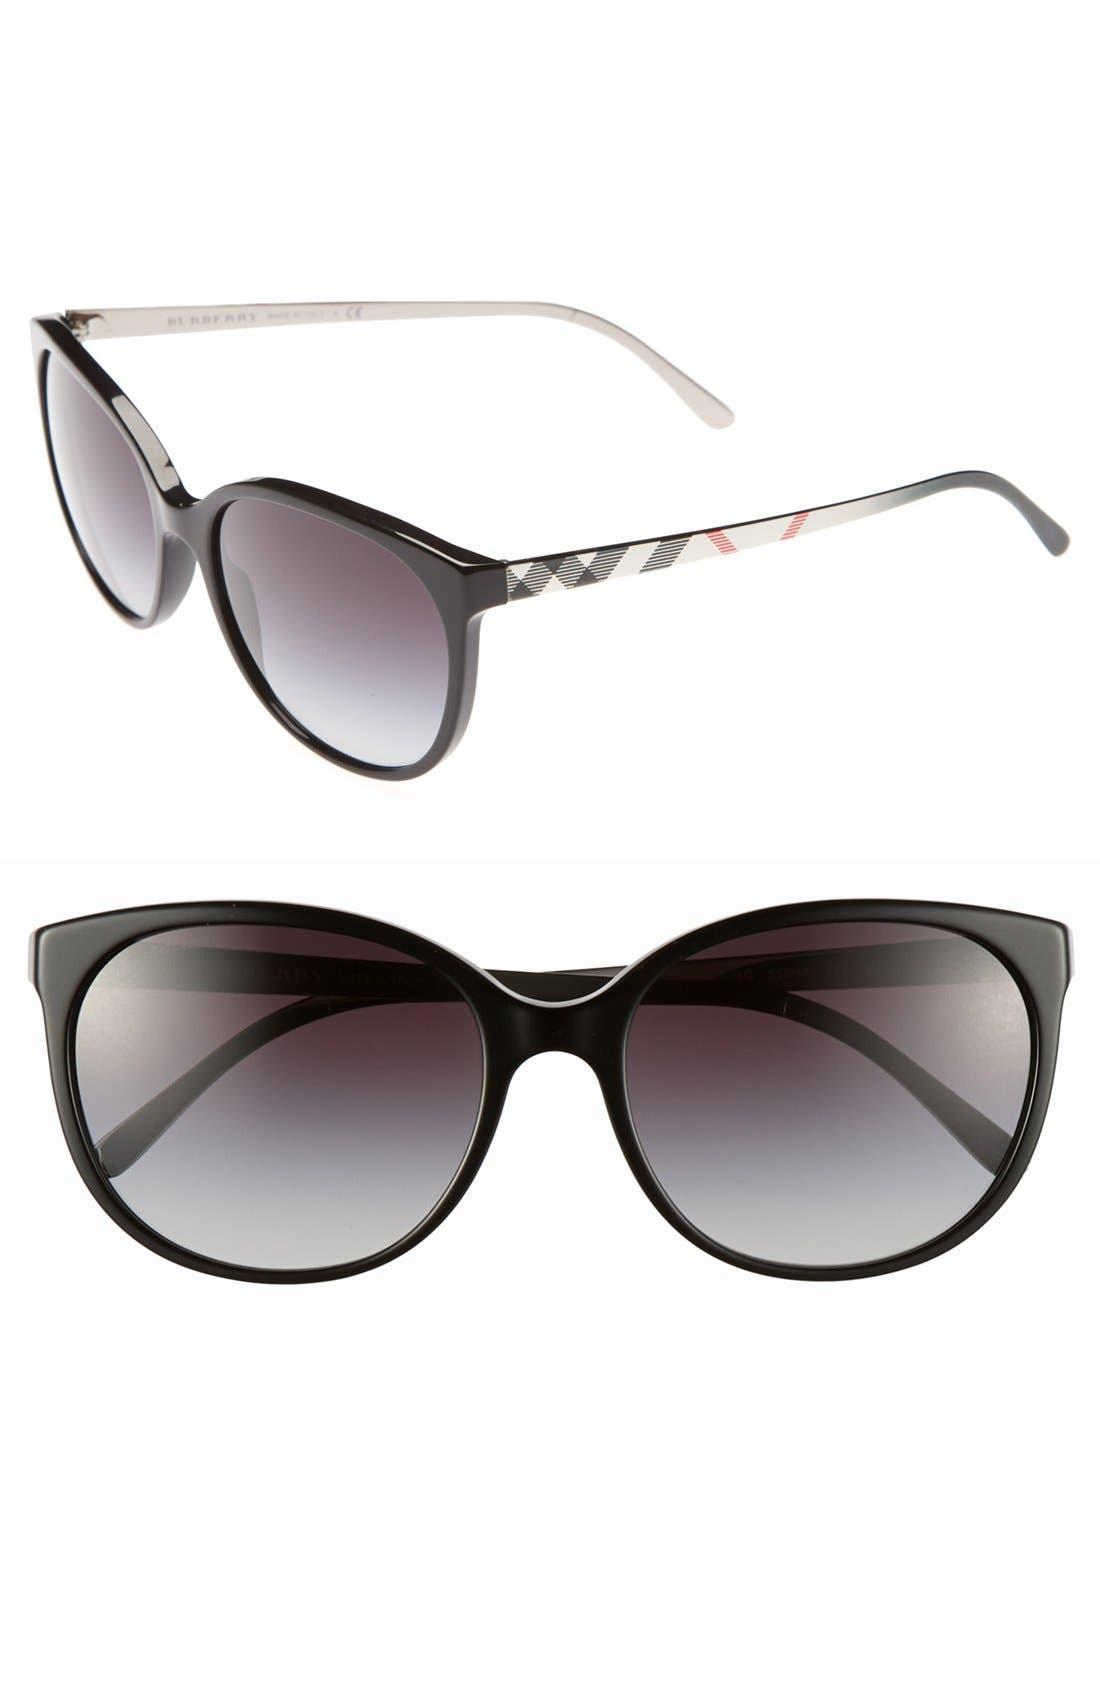 Main Image - Burberry 'Spark' 55mm Sunglasses